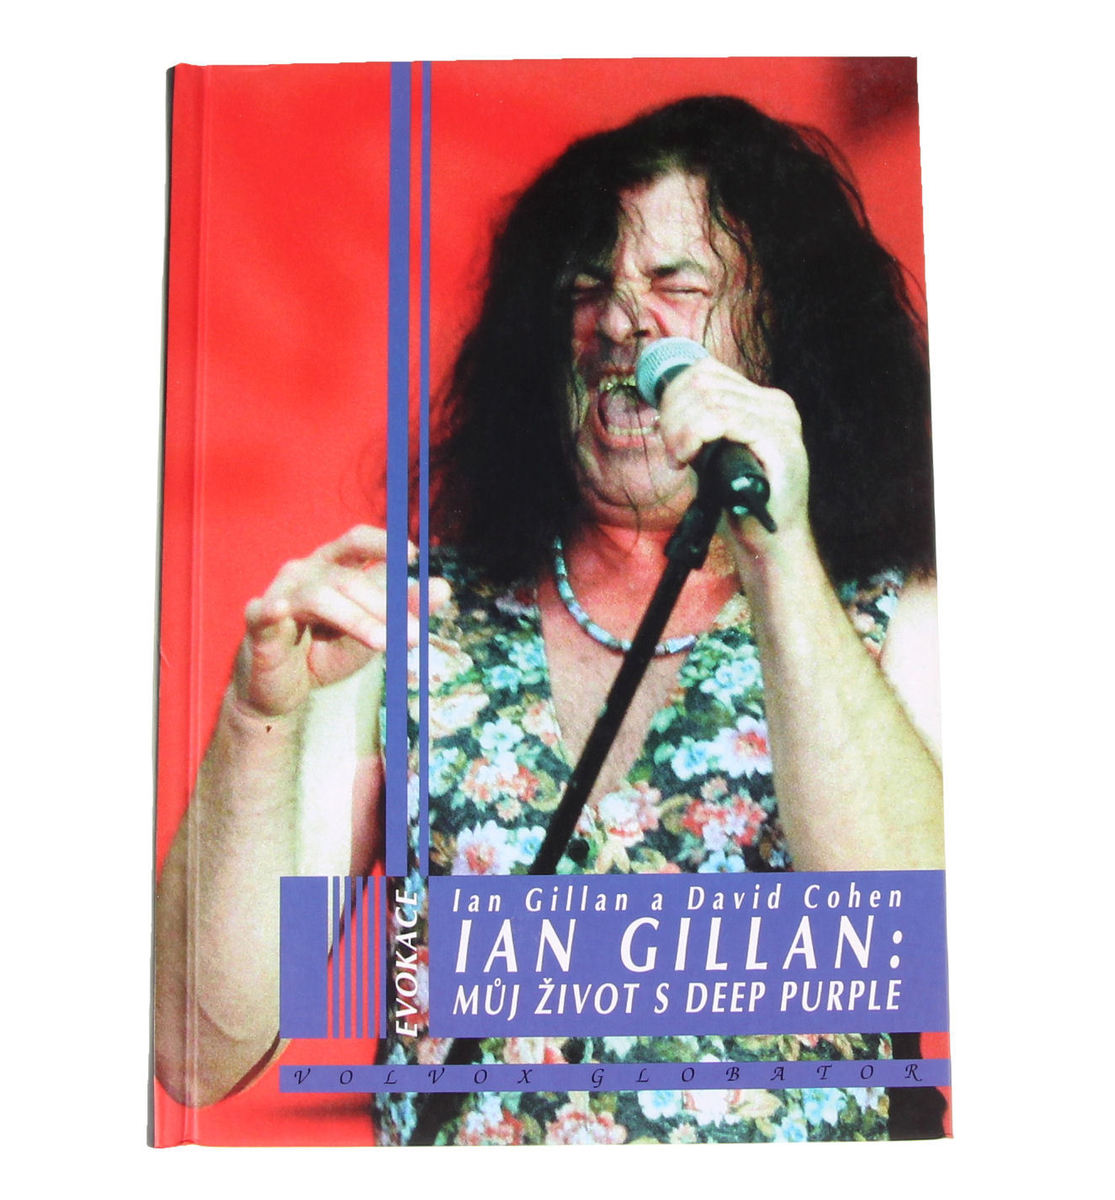 kniha Deep Purple - Můj život s Deep Purple, autor:Ian Gillan, David Cohen